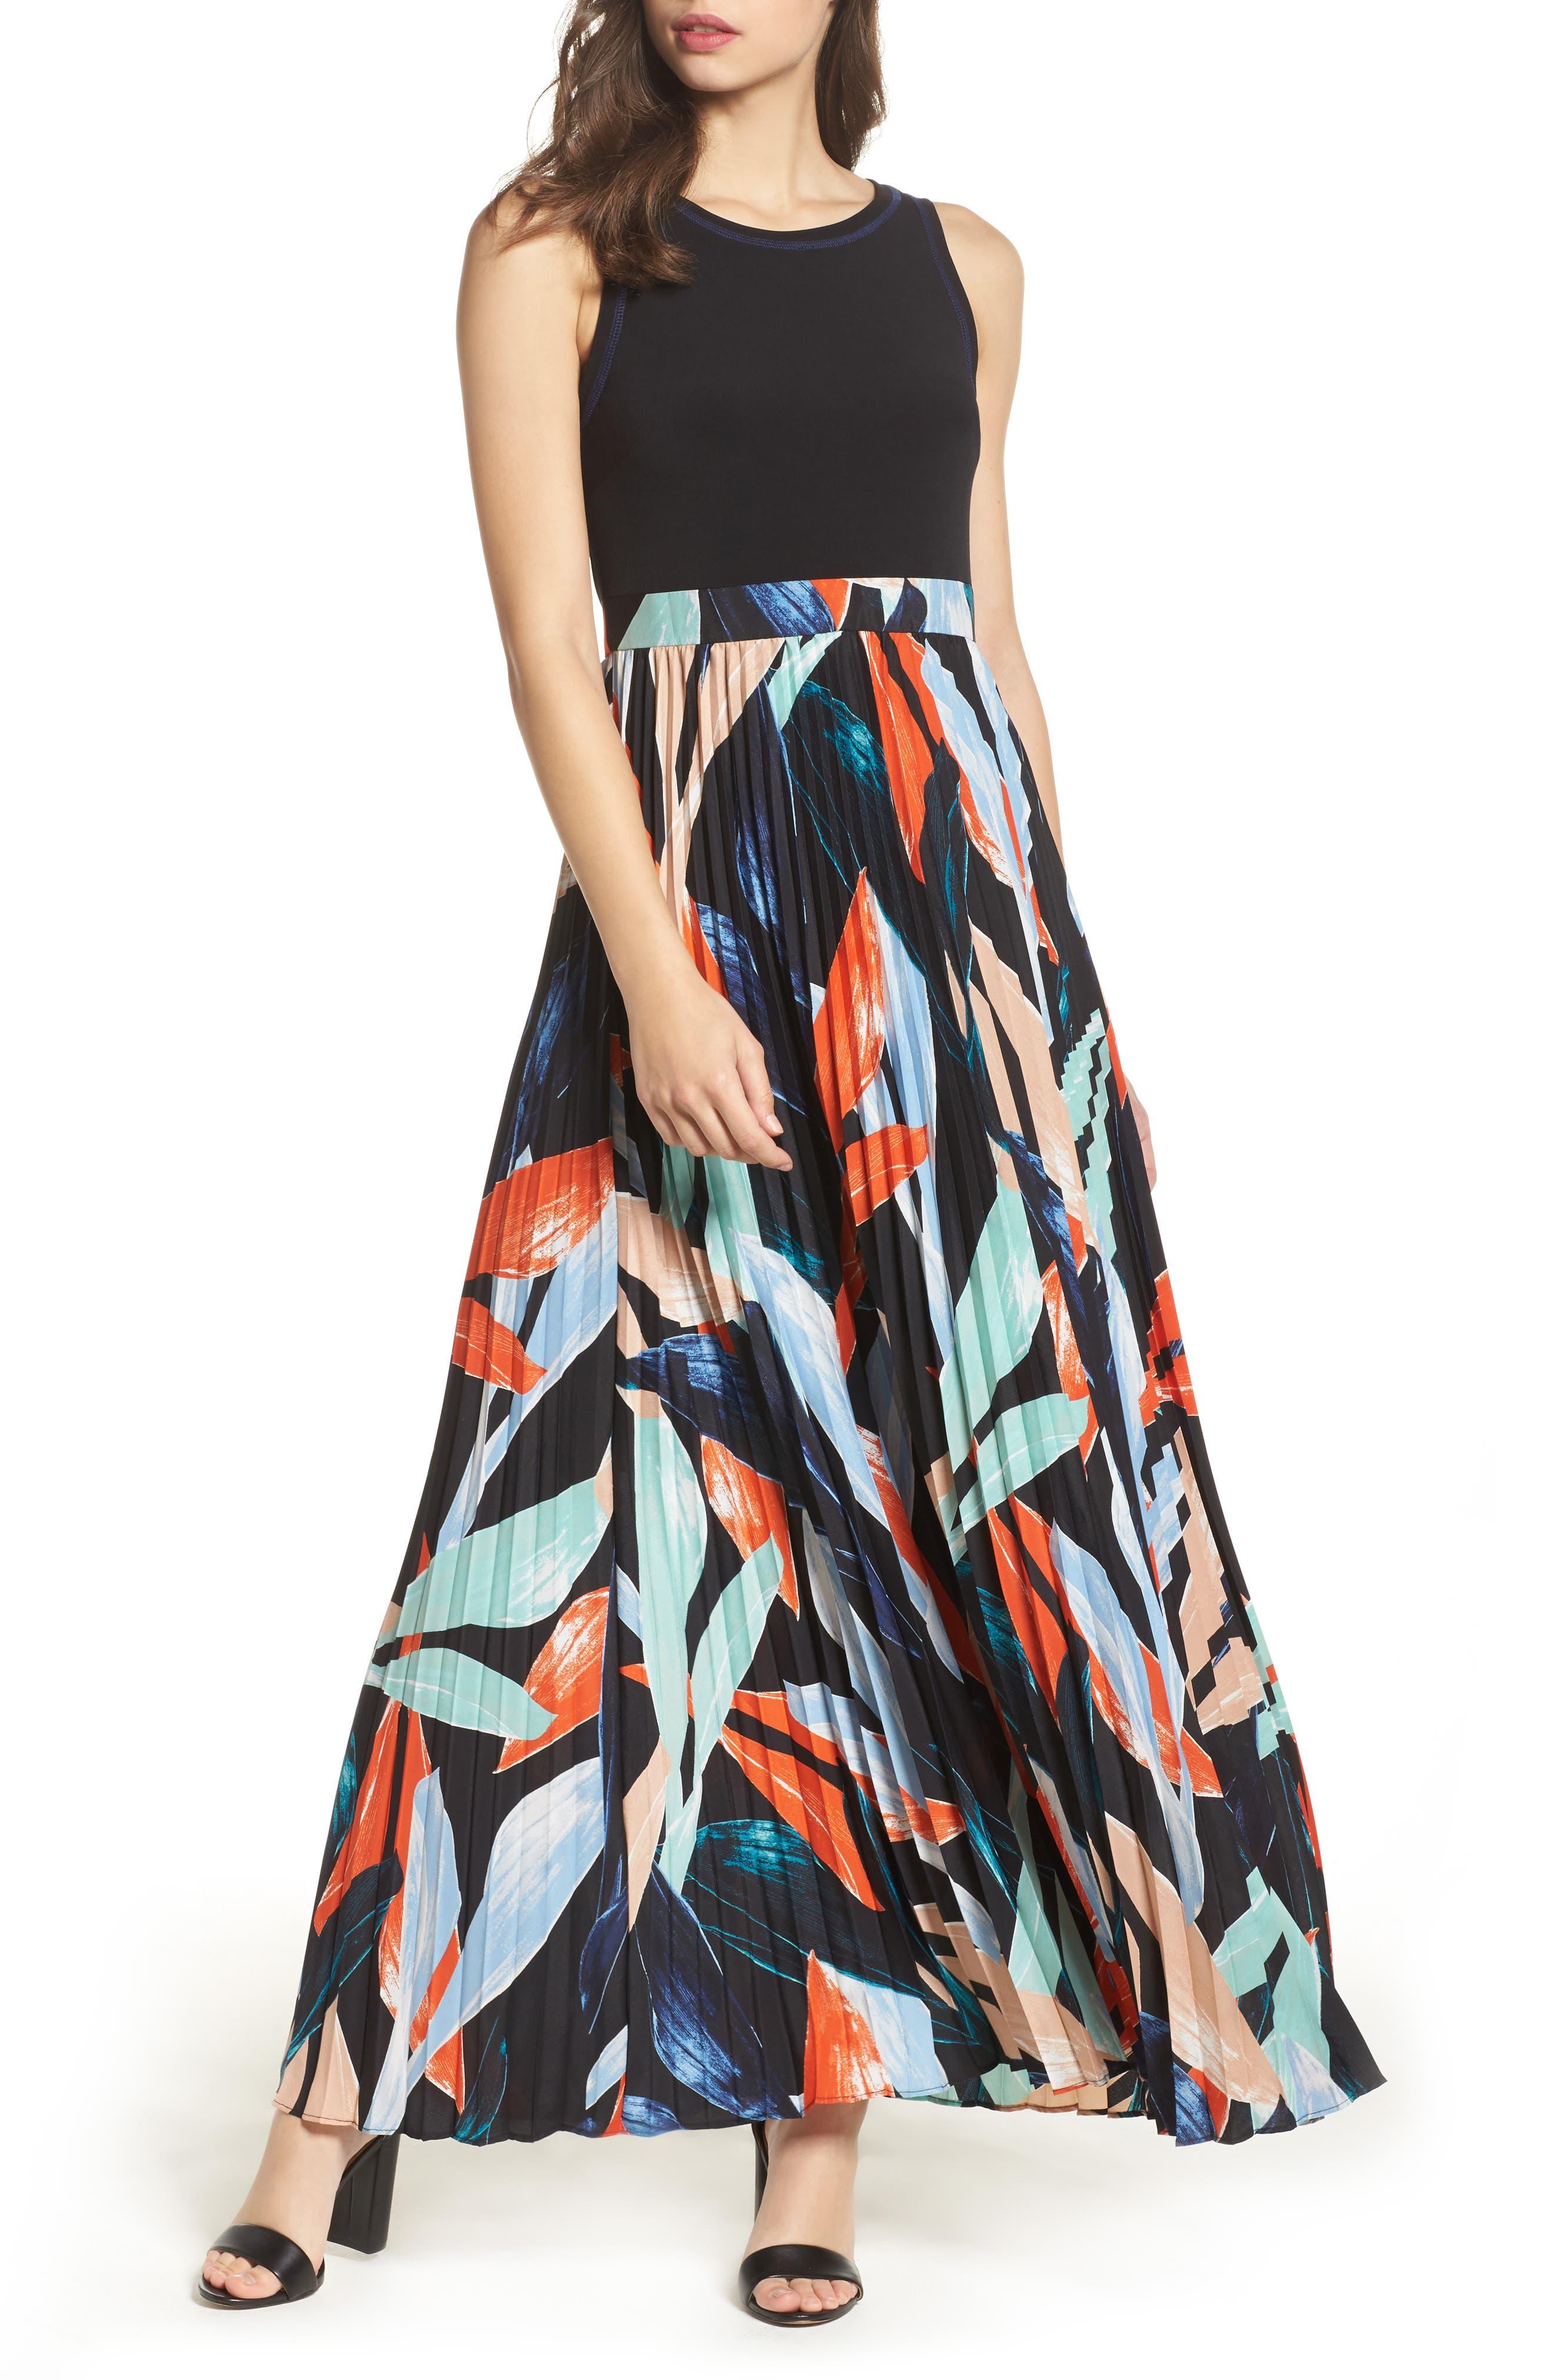 Alternate Image 1 Selected - Vince Camuto Pleated Maxi Dress (Regular & Petite)